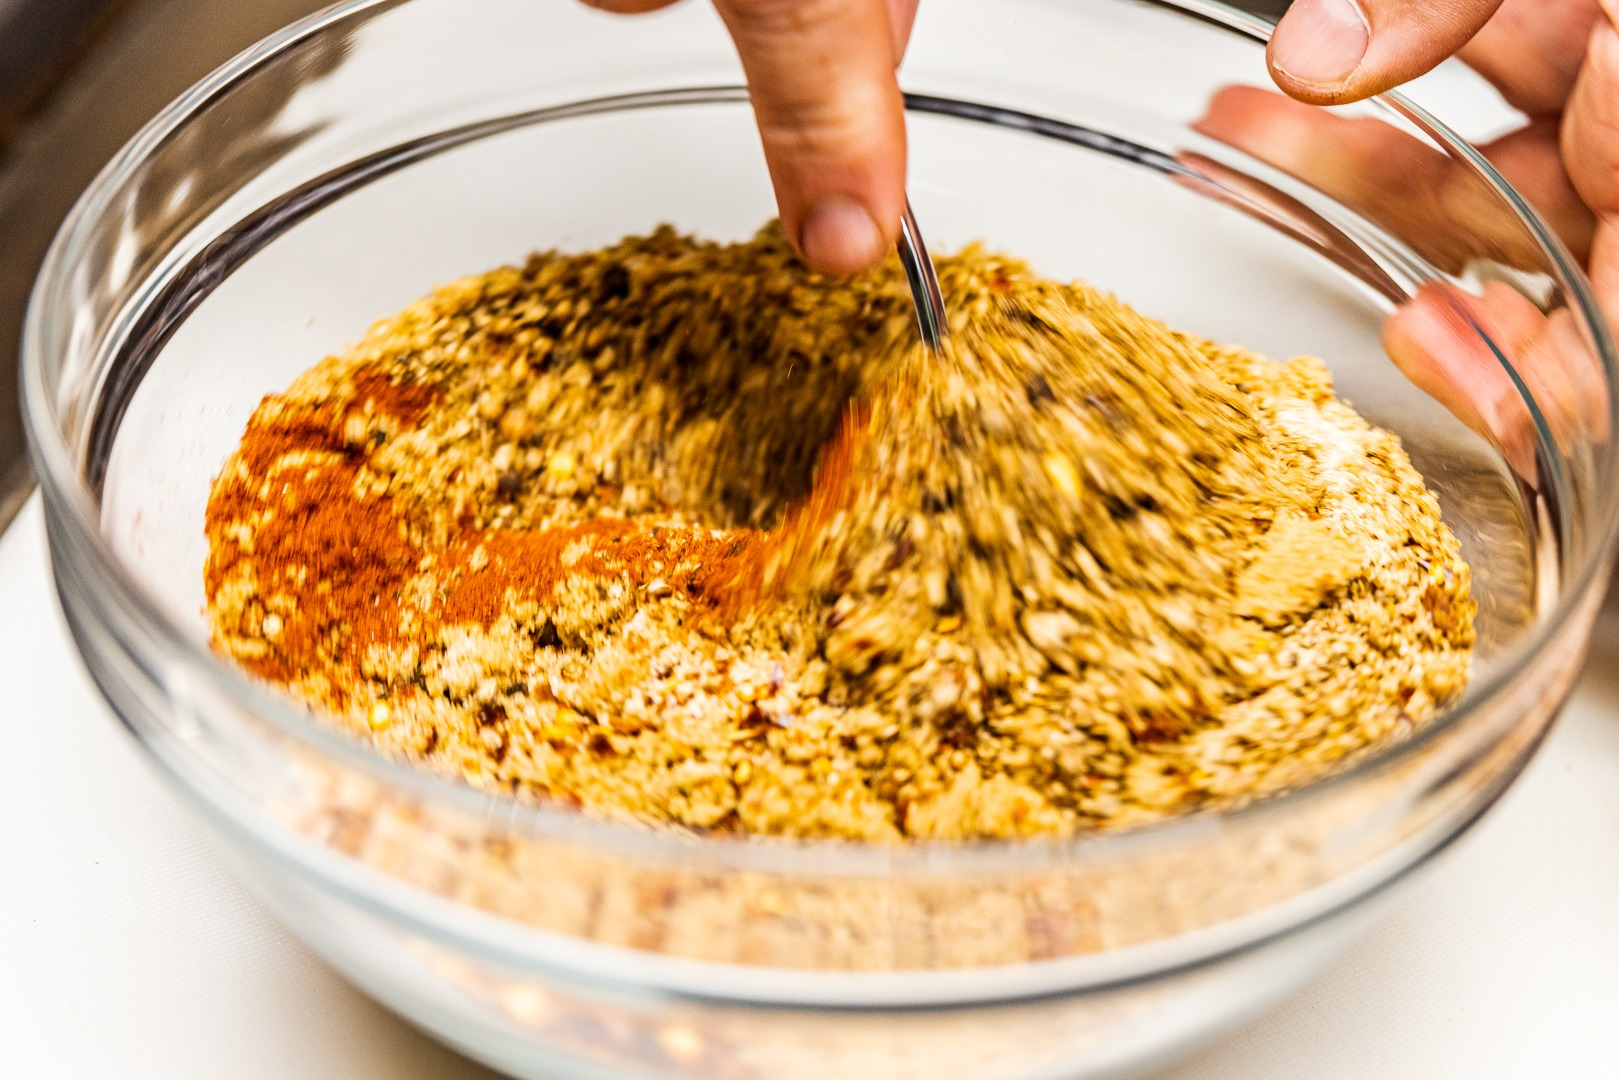 Mixing pastrami rub